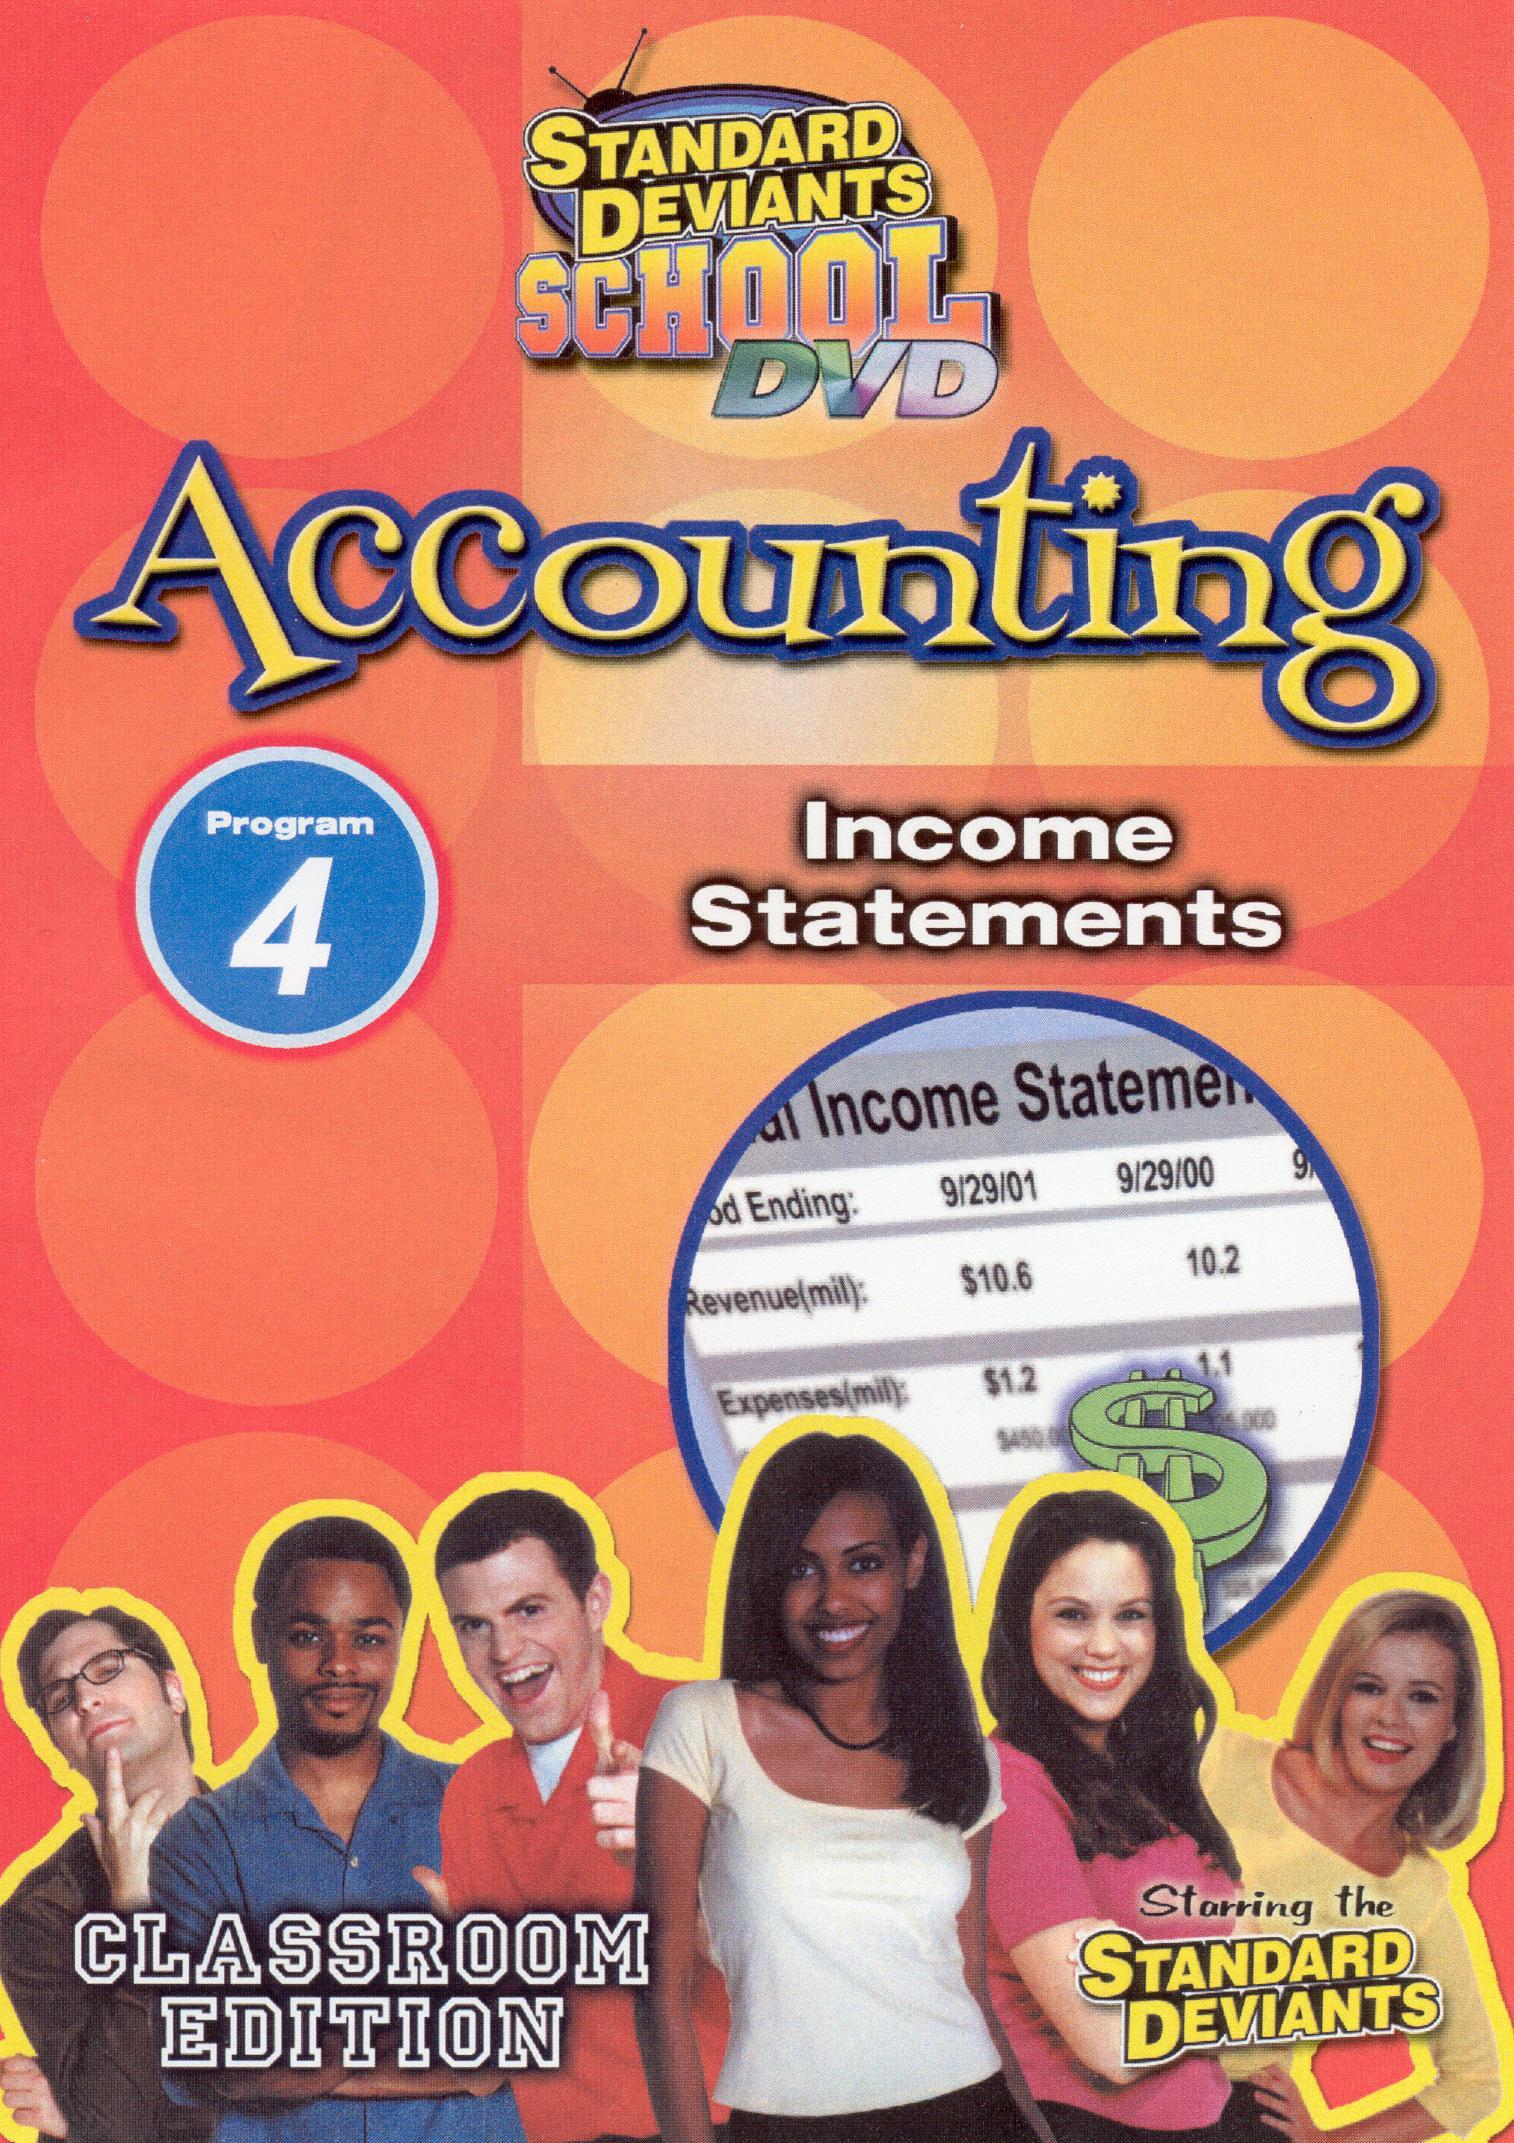 Standard Deviants School: Accounting, Program 4